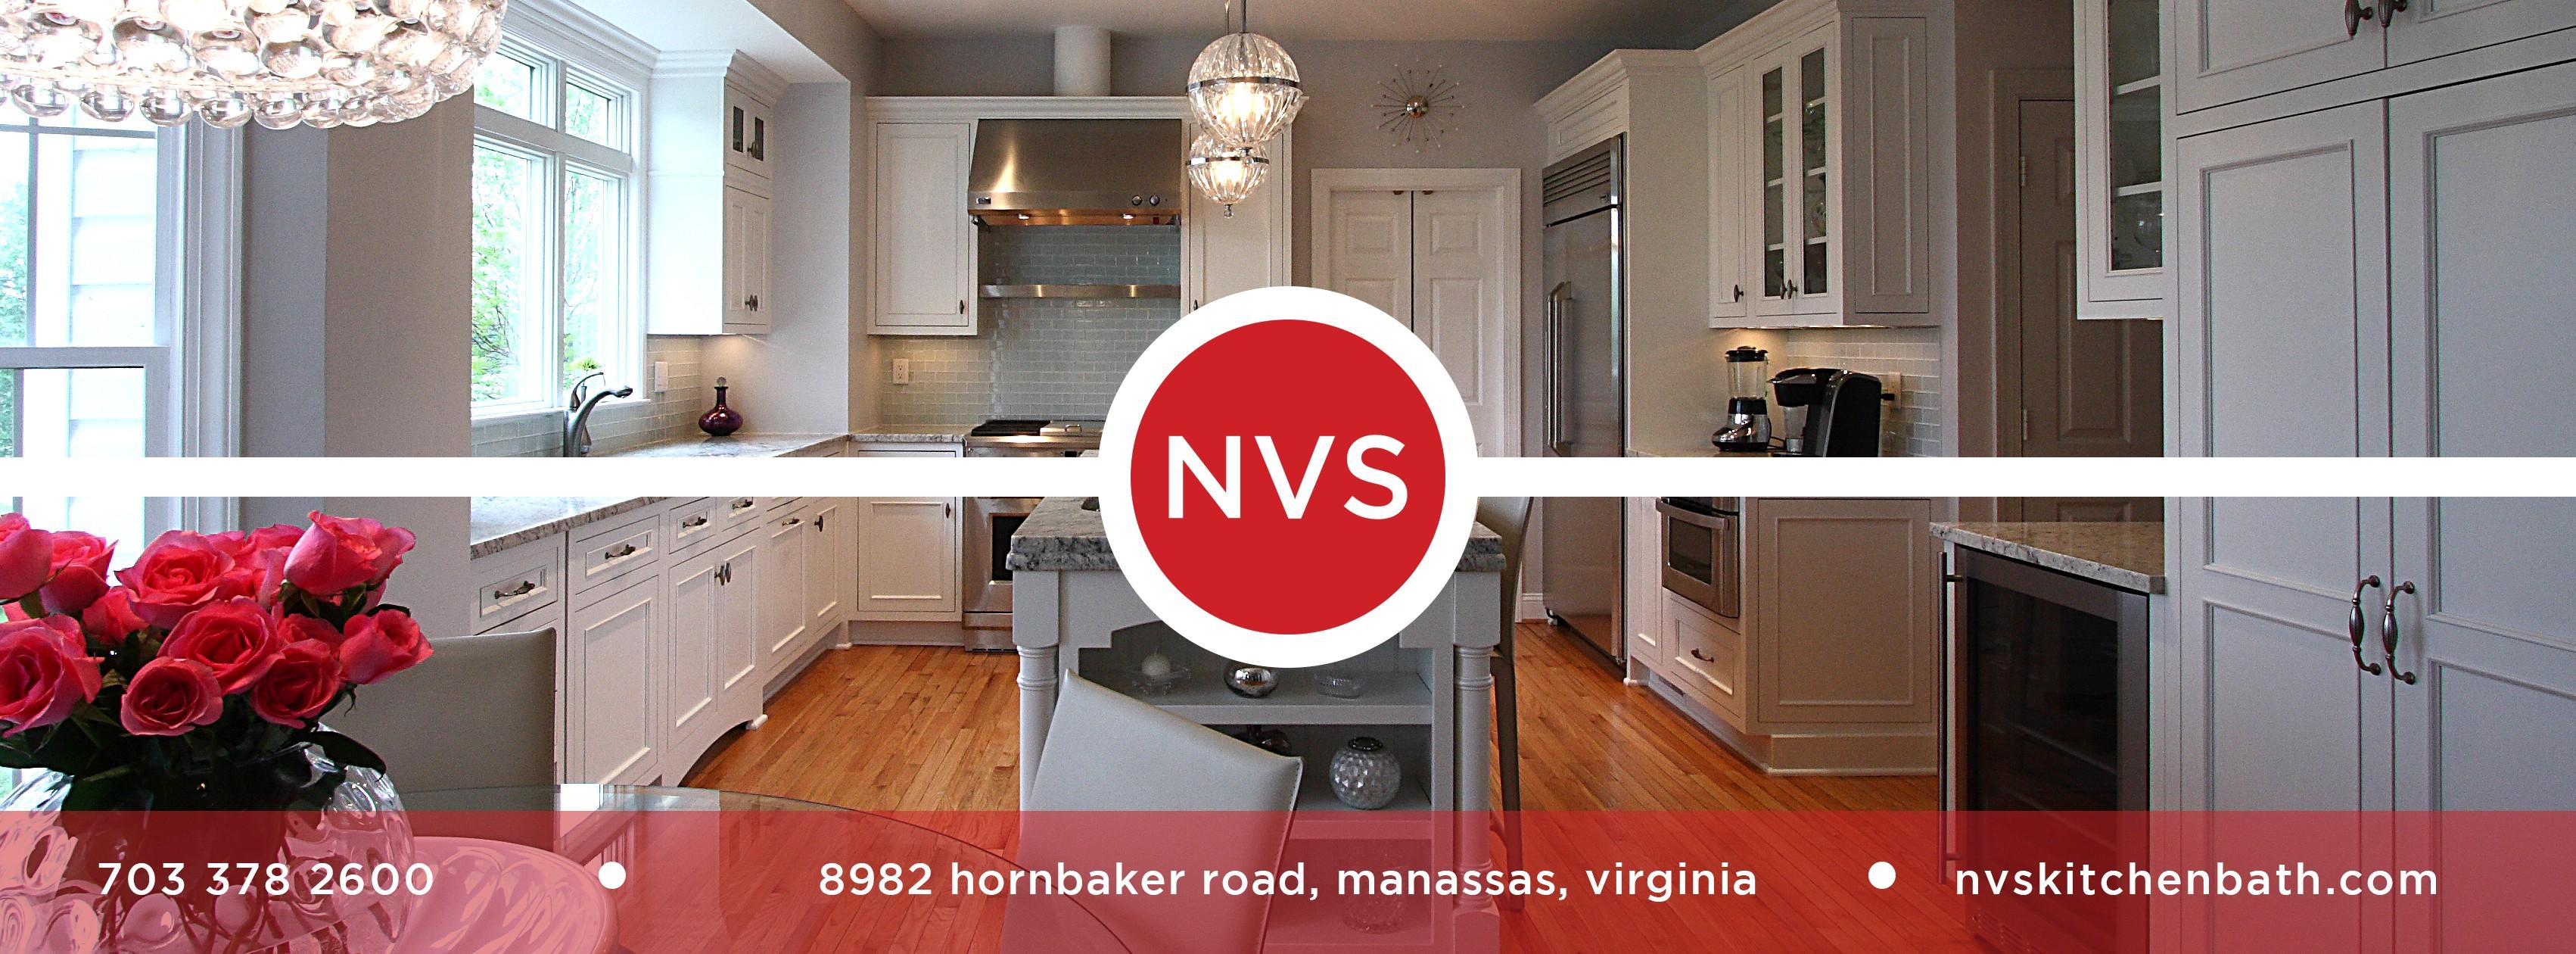 NVS Kitchen and Bath | LinkedIn